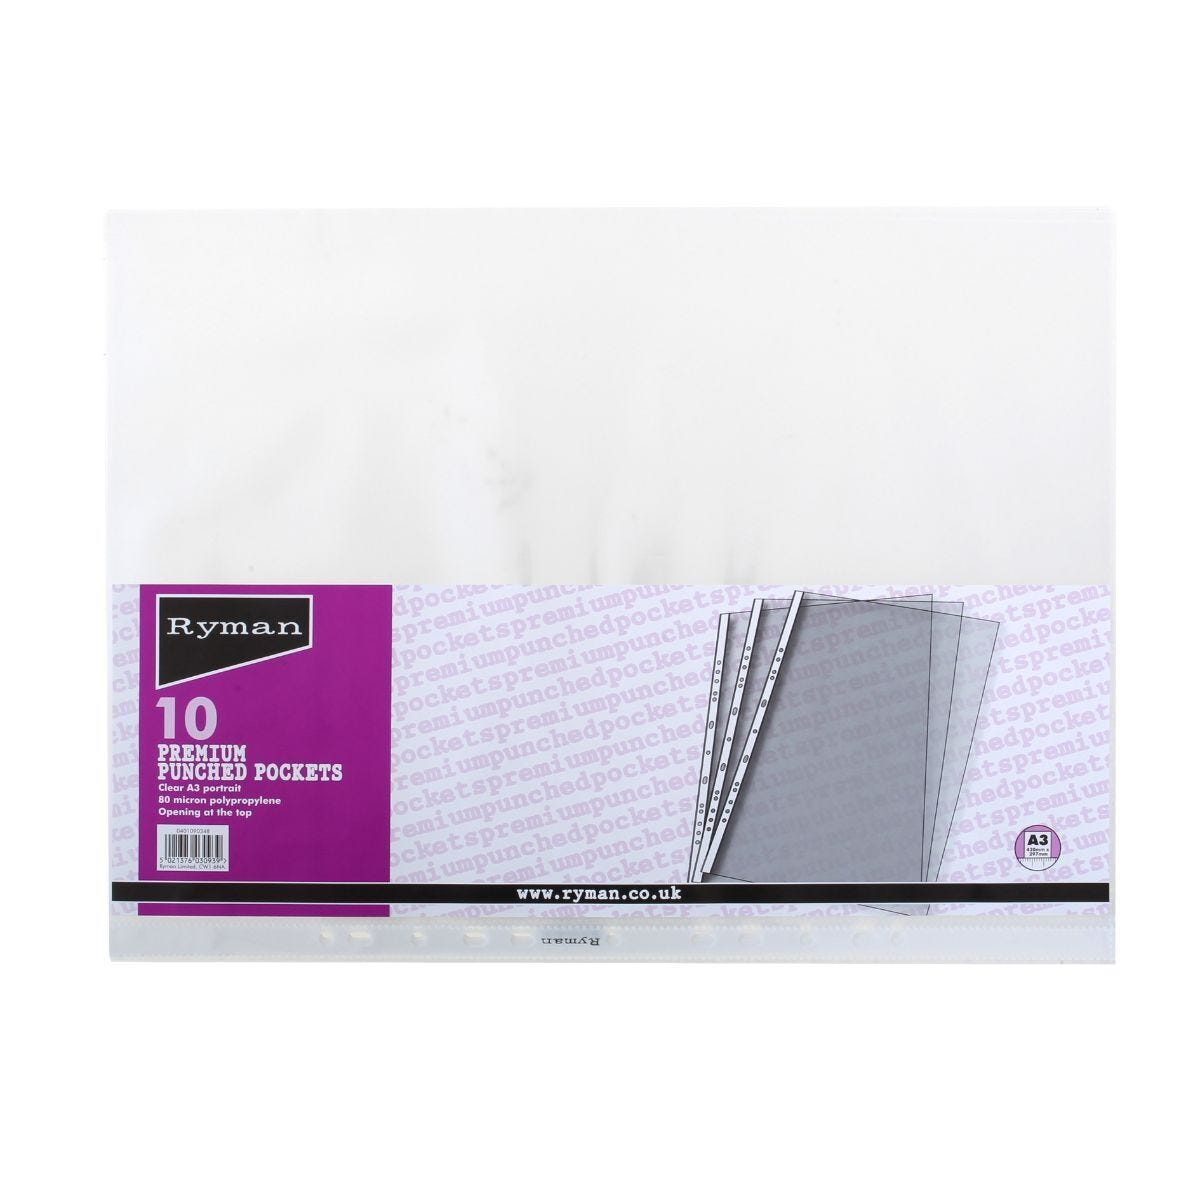 Ryman Premium Pockets 80mic A3 Pack of 100 Portrait